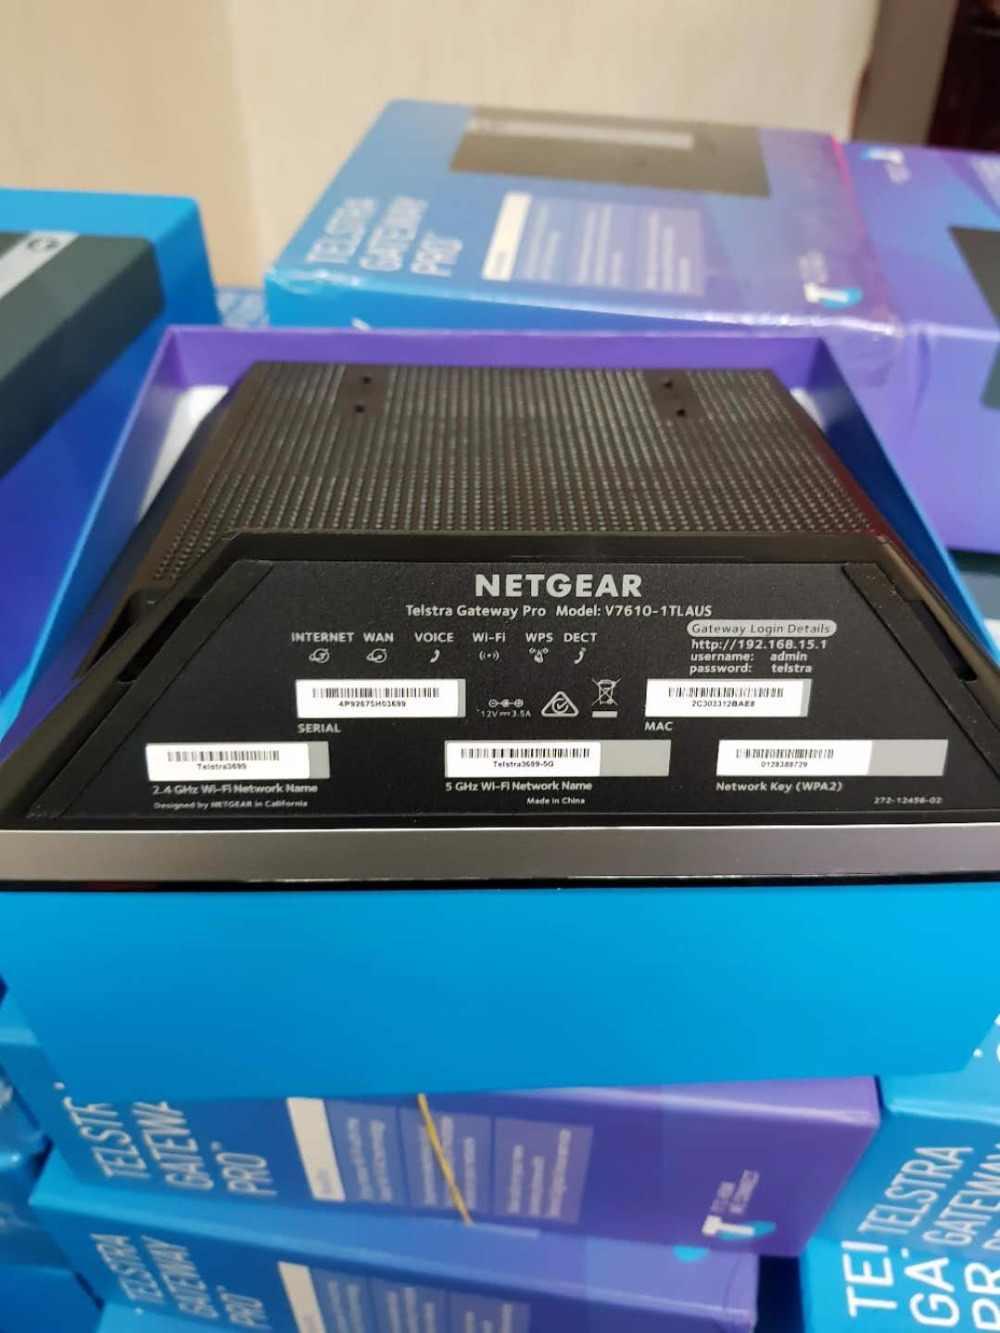 Telstra Gateway Pro (Netgear v7610) New In Box NBN Router Modem